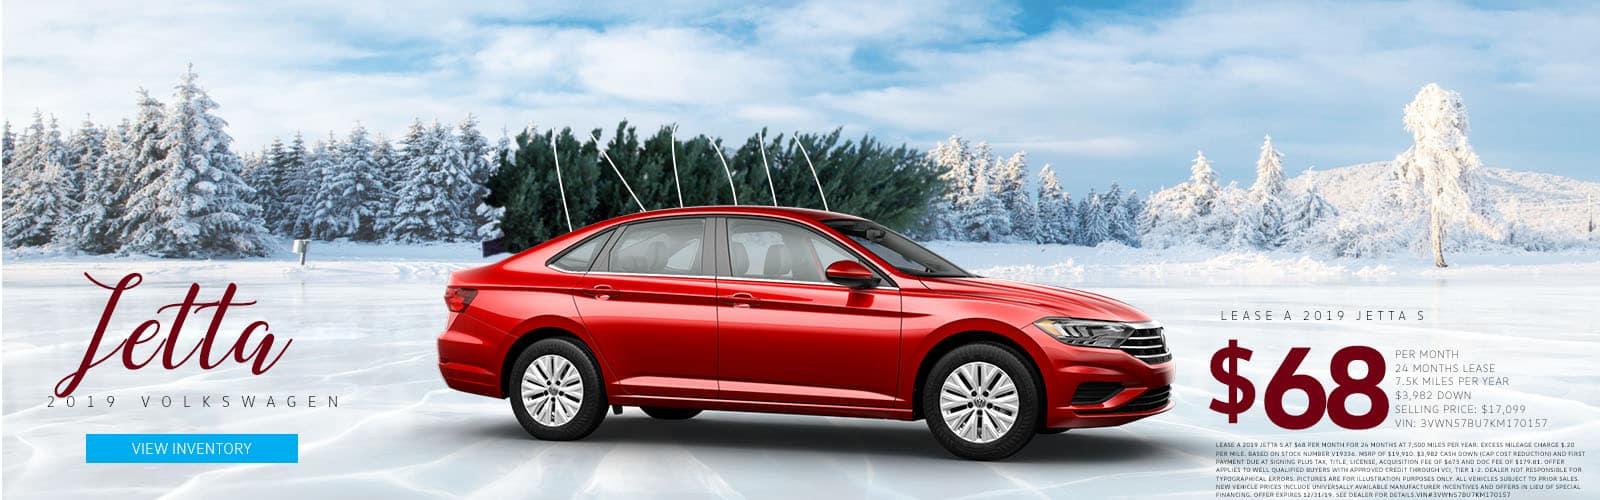 VW Dealer Chicago >> Bill Jacobs Volkswagen Auto Dealership Service Center In